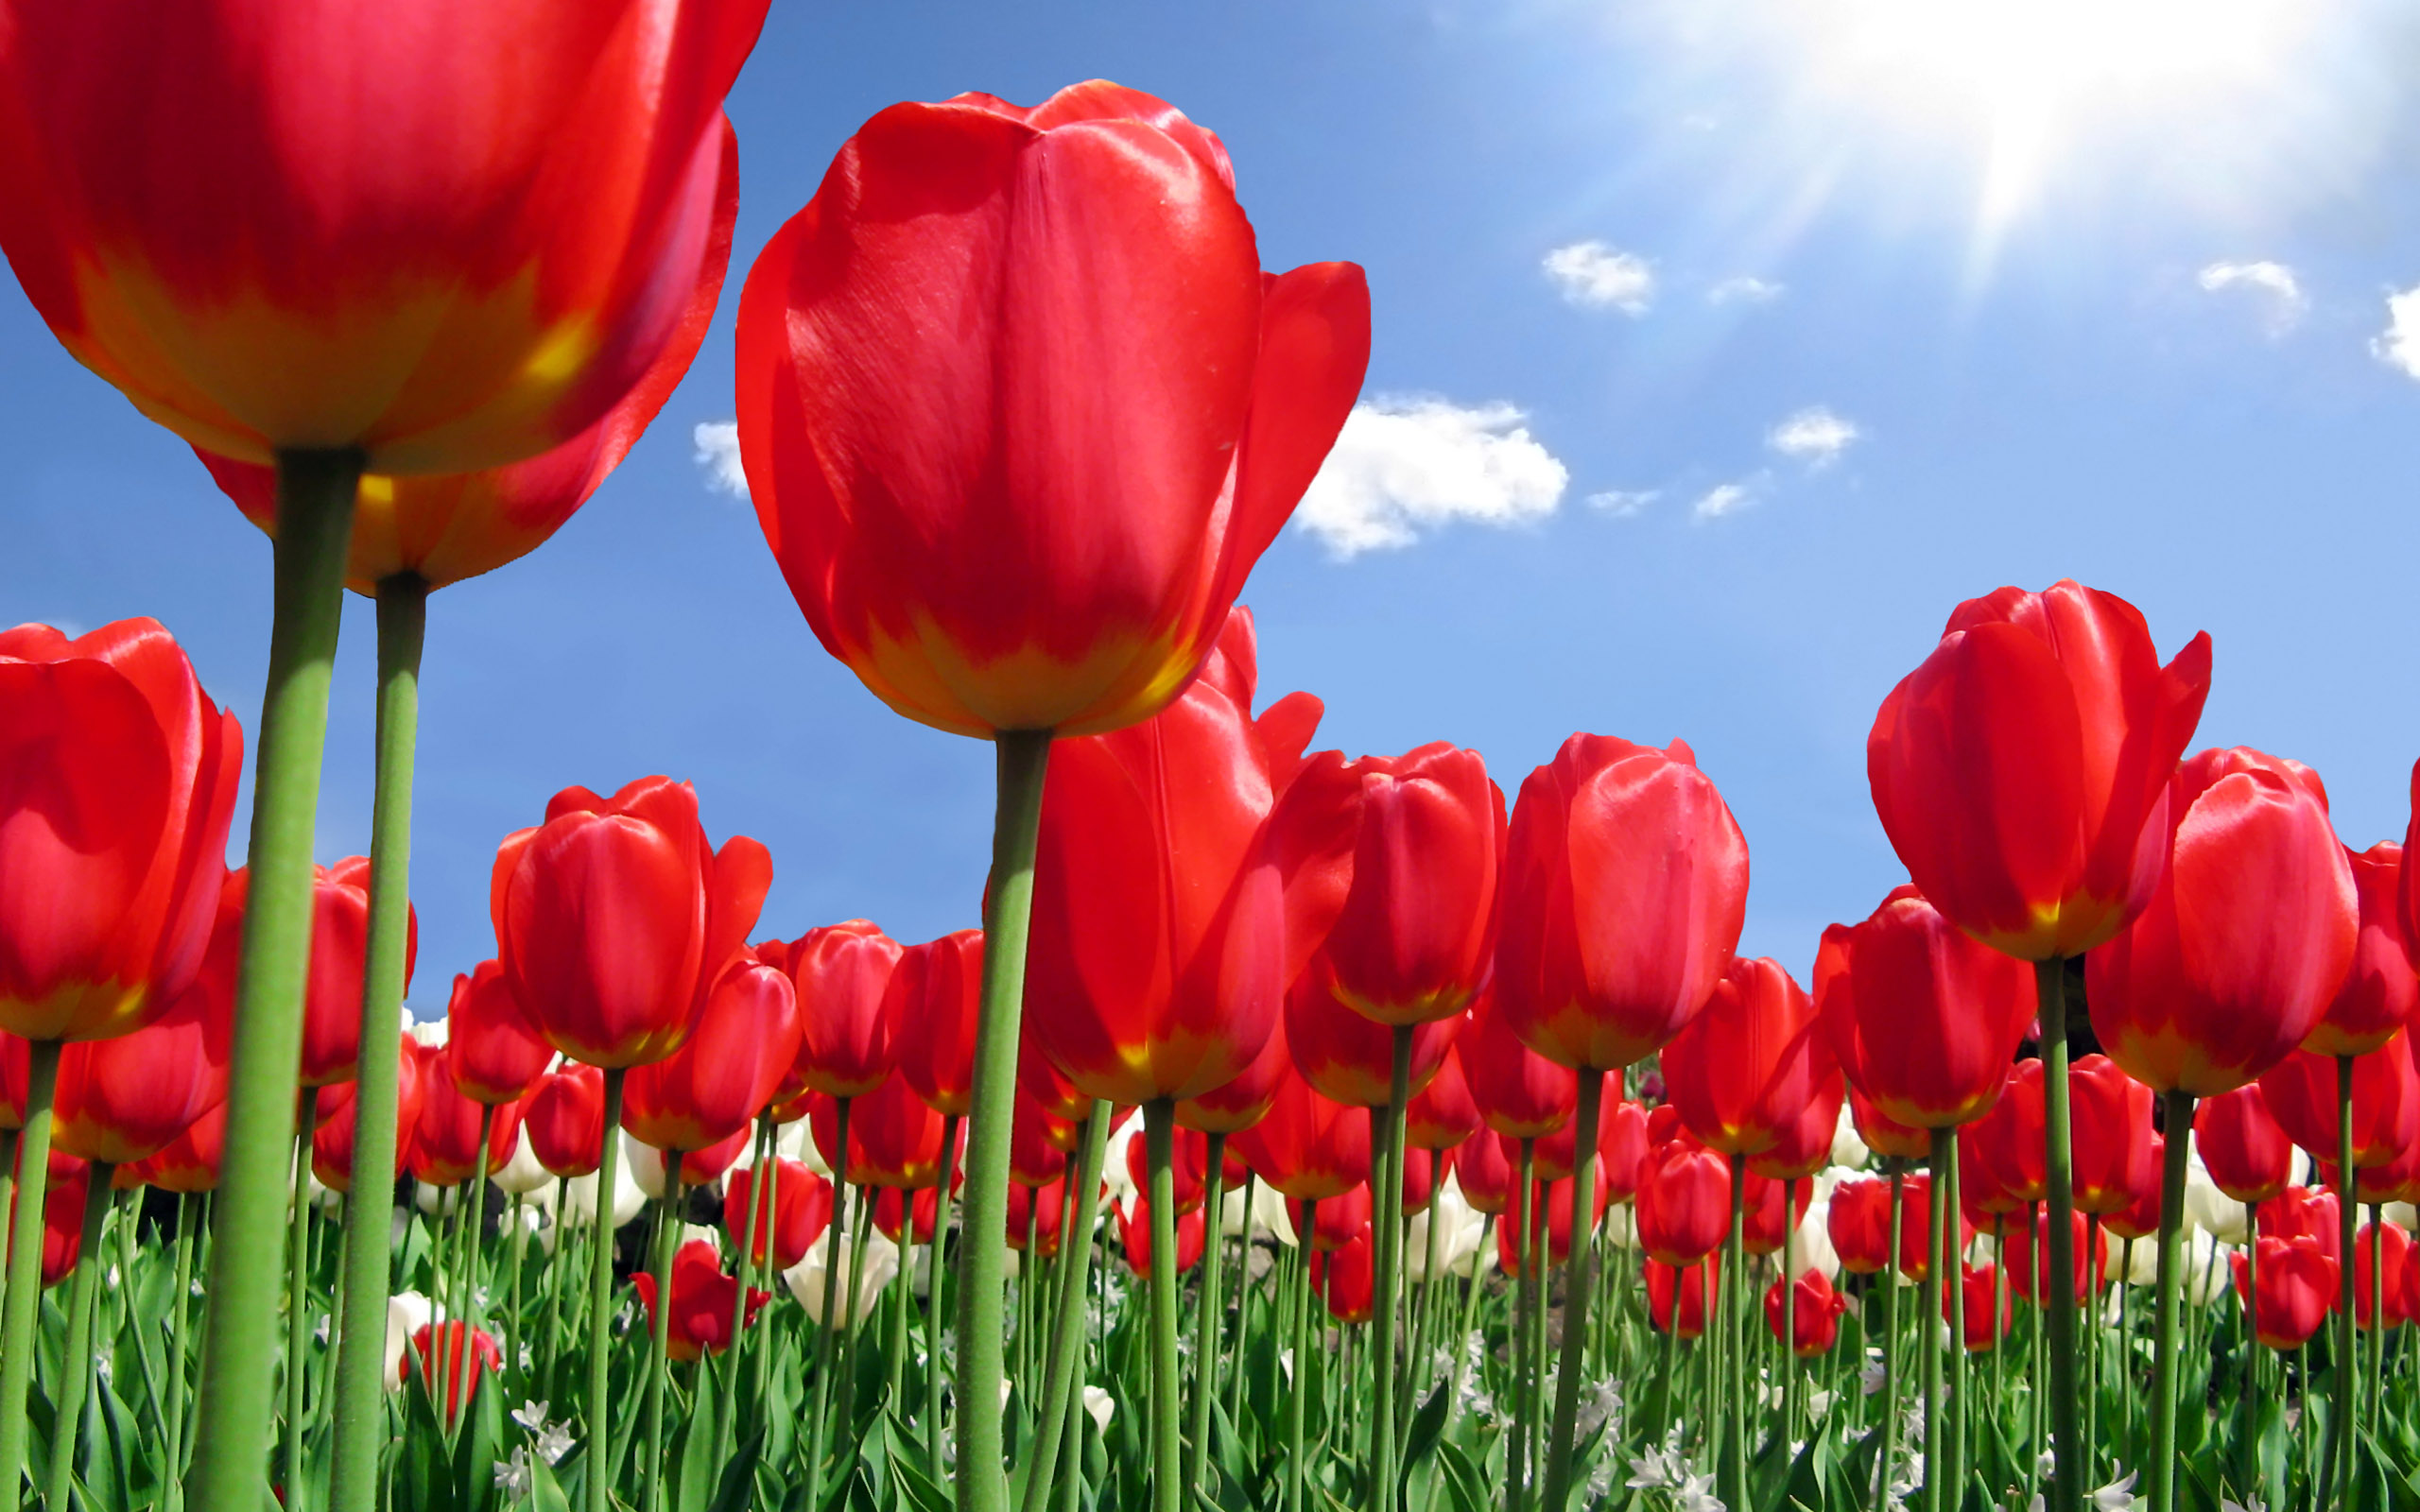 Spring flowers wallpaper backgrounds sf wallpaper spring background free download pixelstalk net mightylinksfo